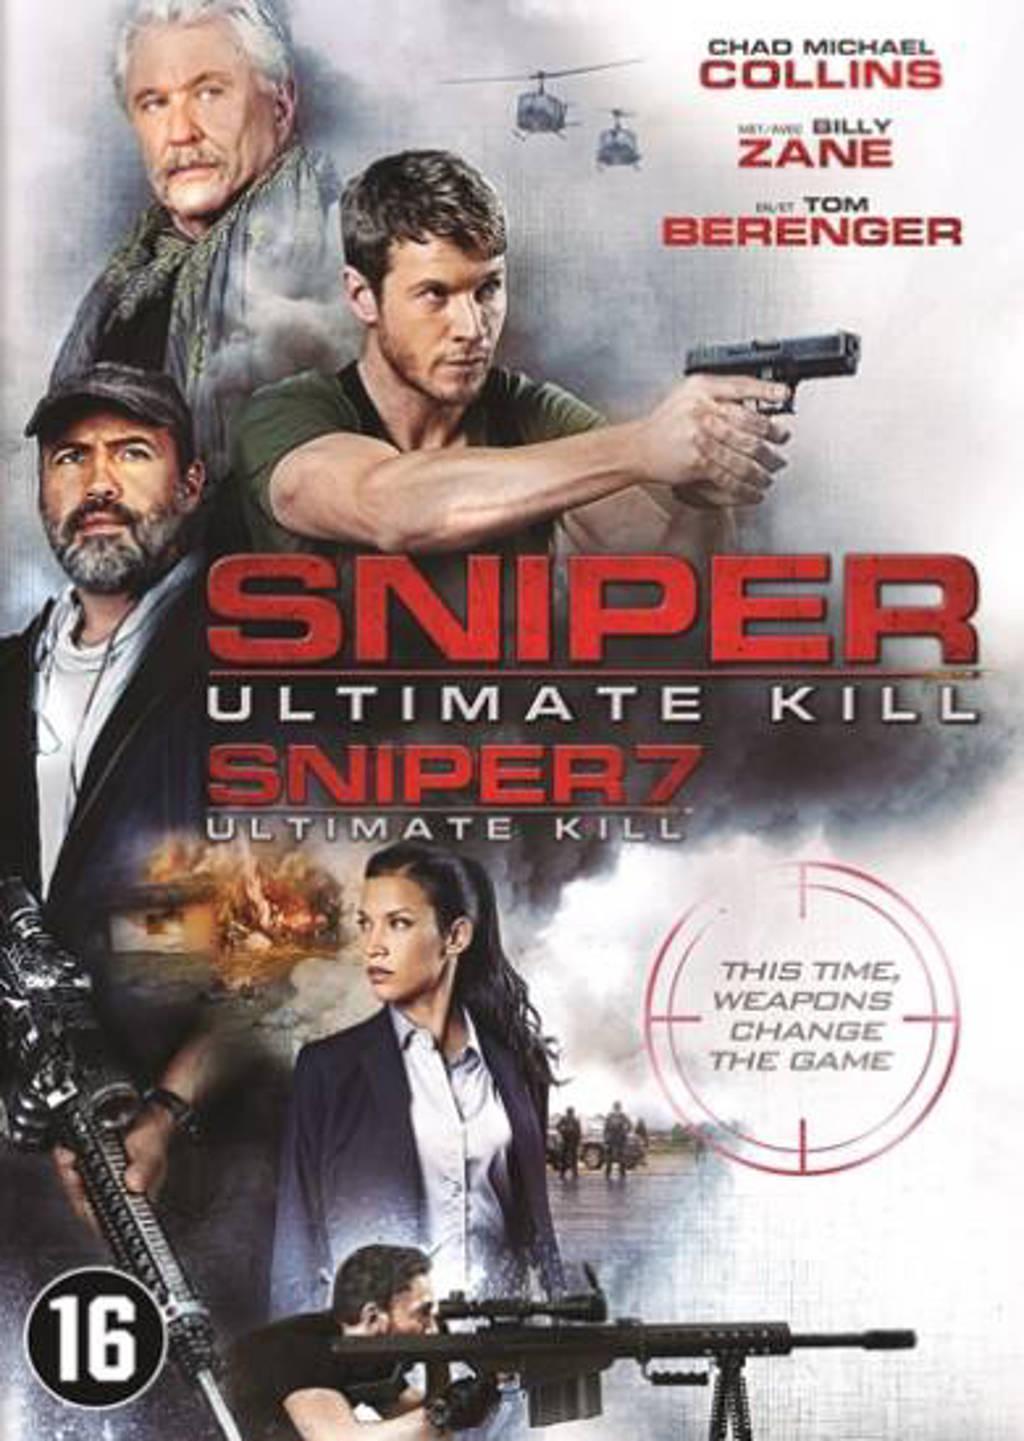 Sniper - Ultimate kill (DVD)